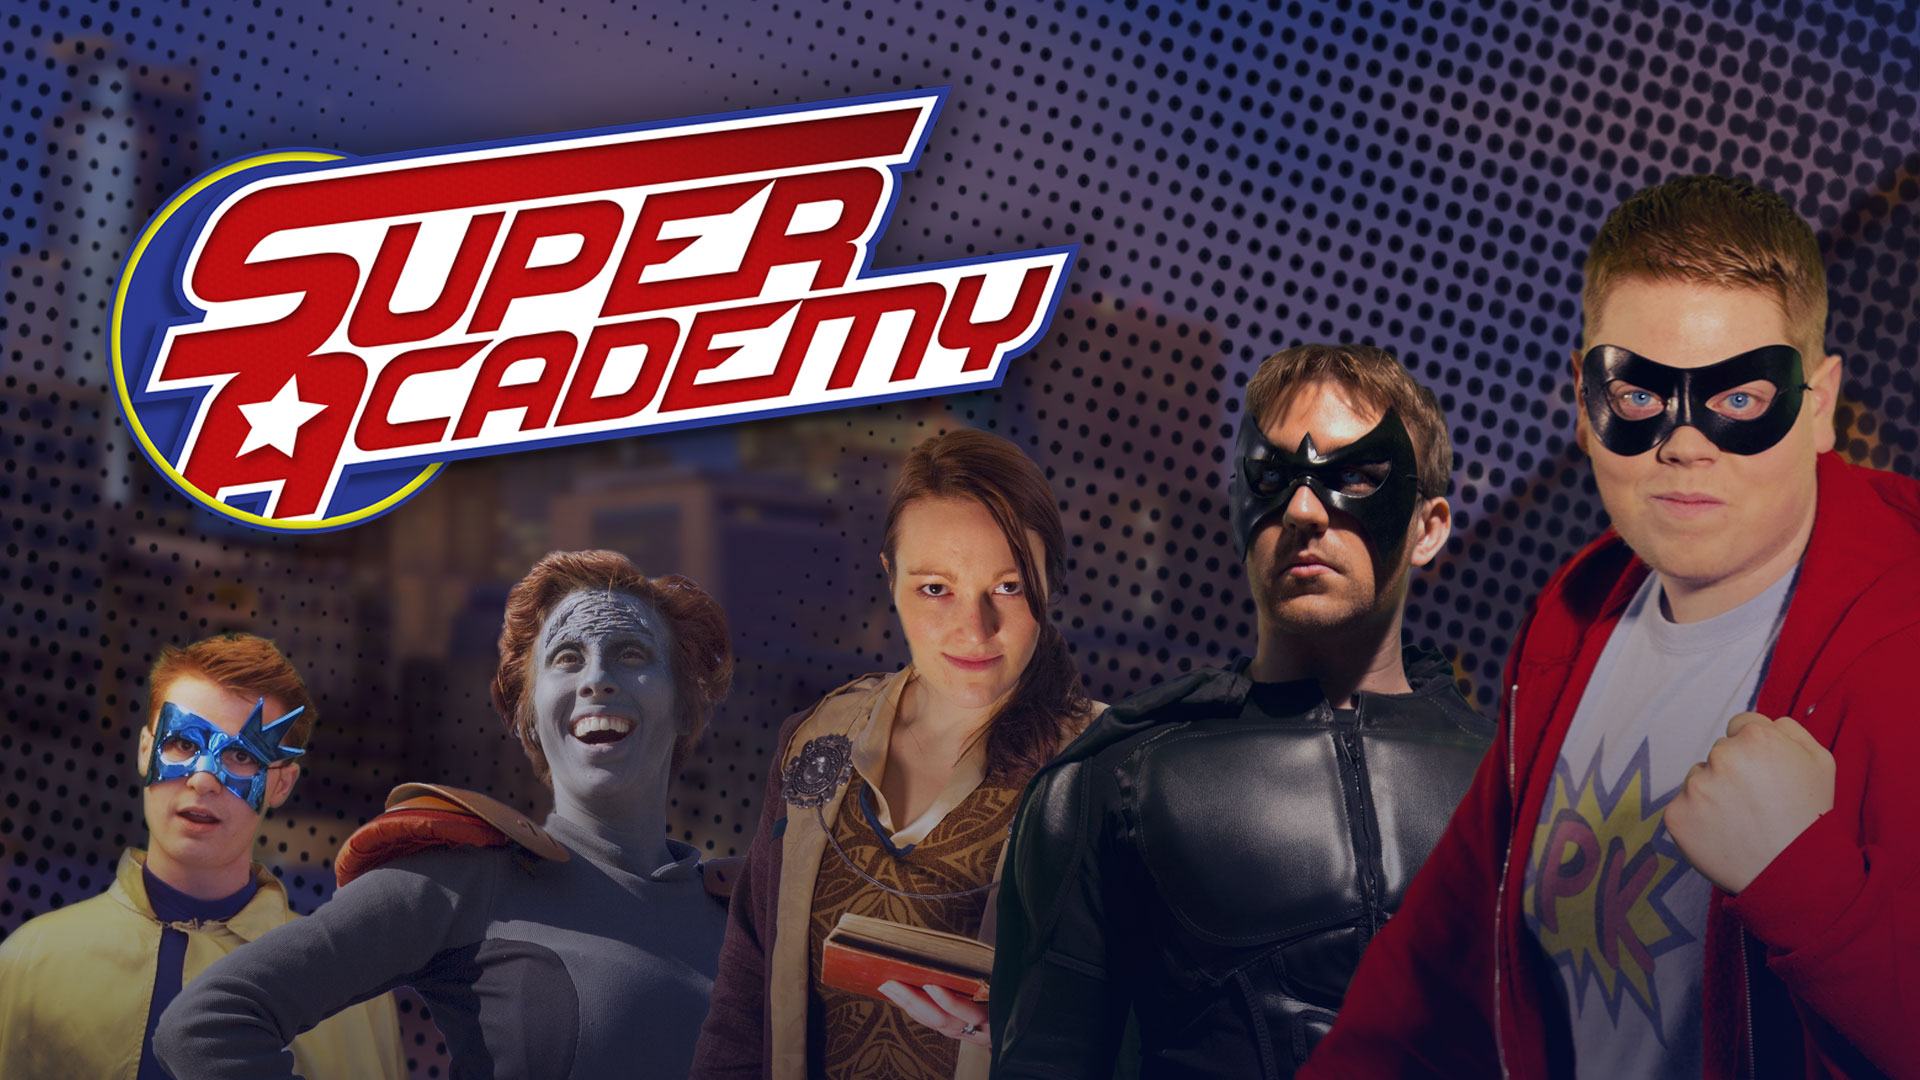 Super Academy